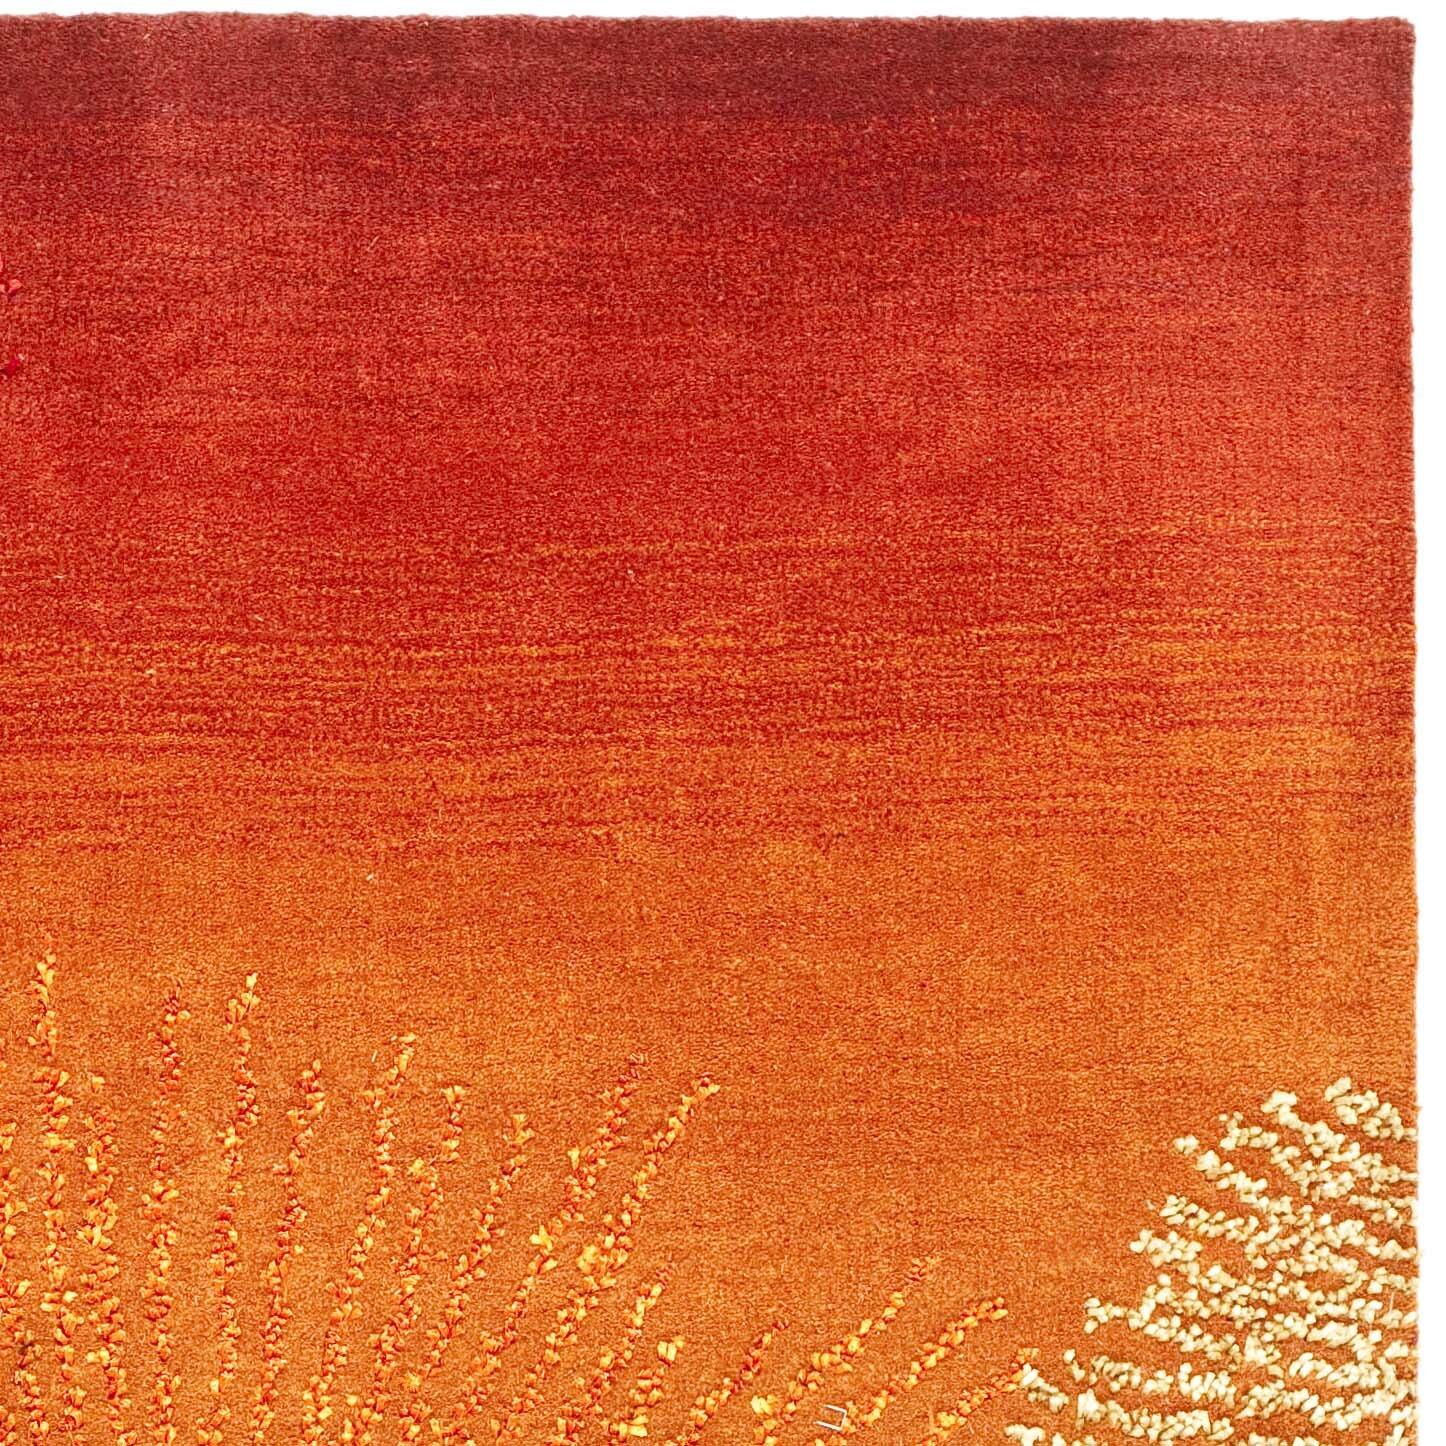 Area Rug 8x10 Orange: Safavieh Soho Rust/Orange Area Rug & Reviews